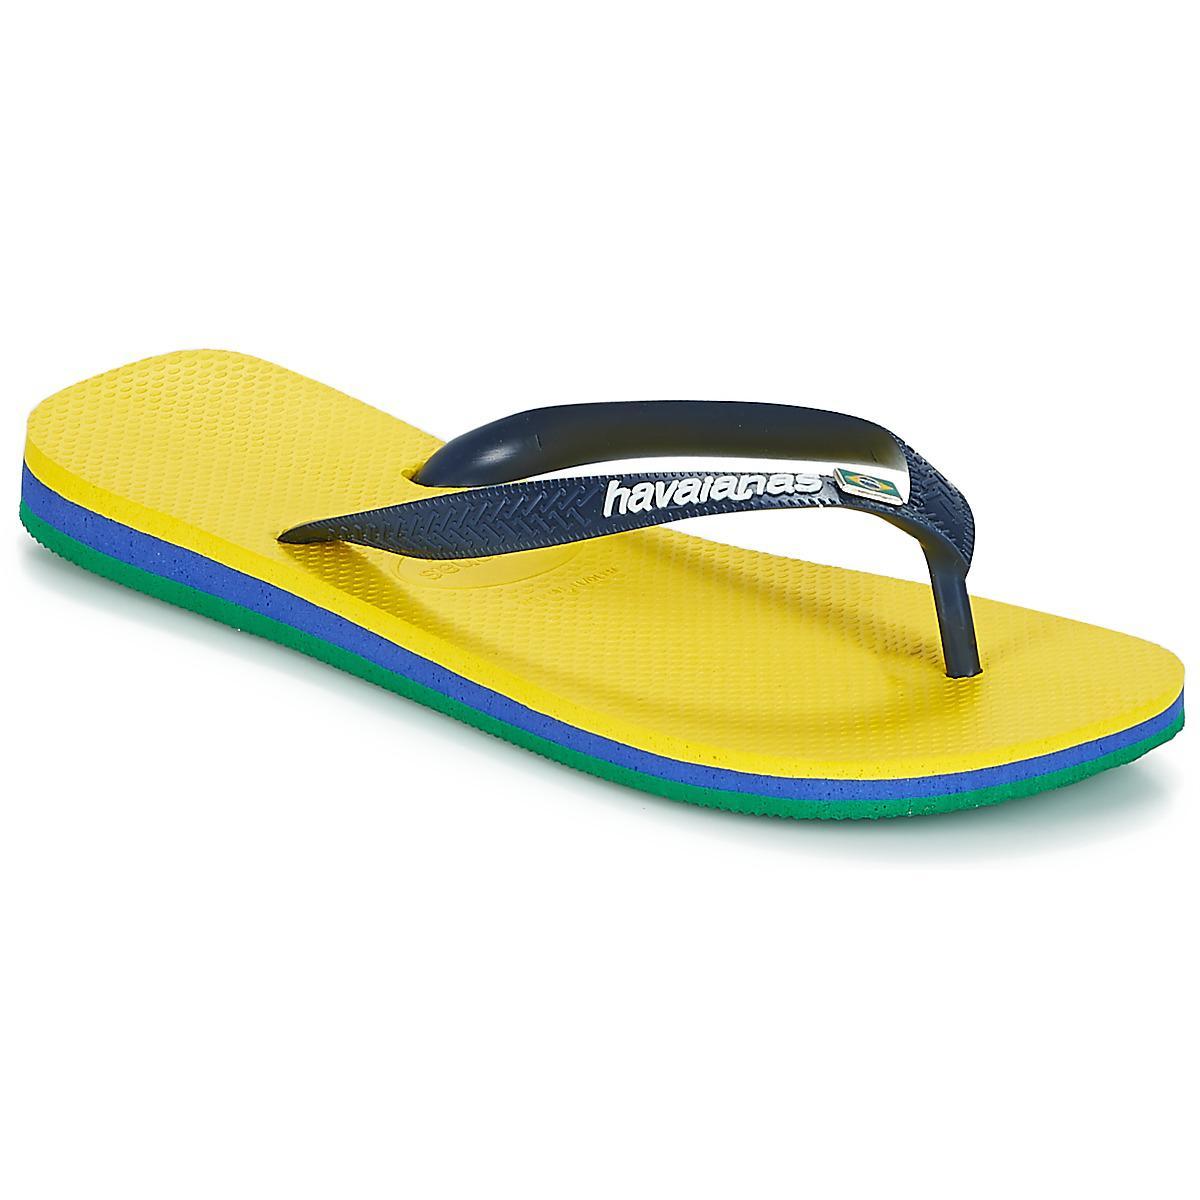 8203796f2cea Havaianas - Brasil Layers Women s Flip Flops   Sandals (shoes) In Yellow -  Lyst. View fullscreen